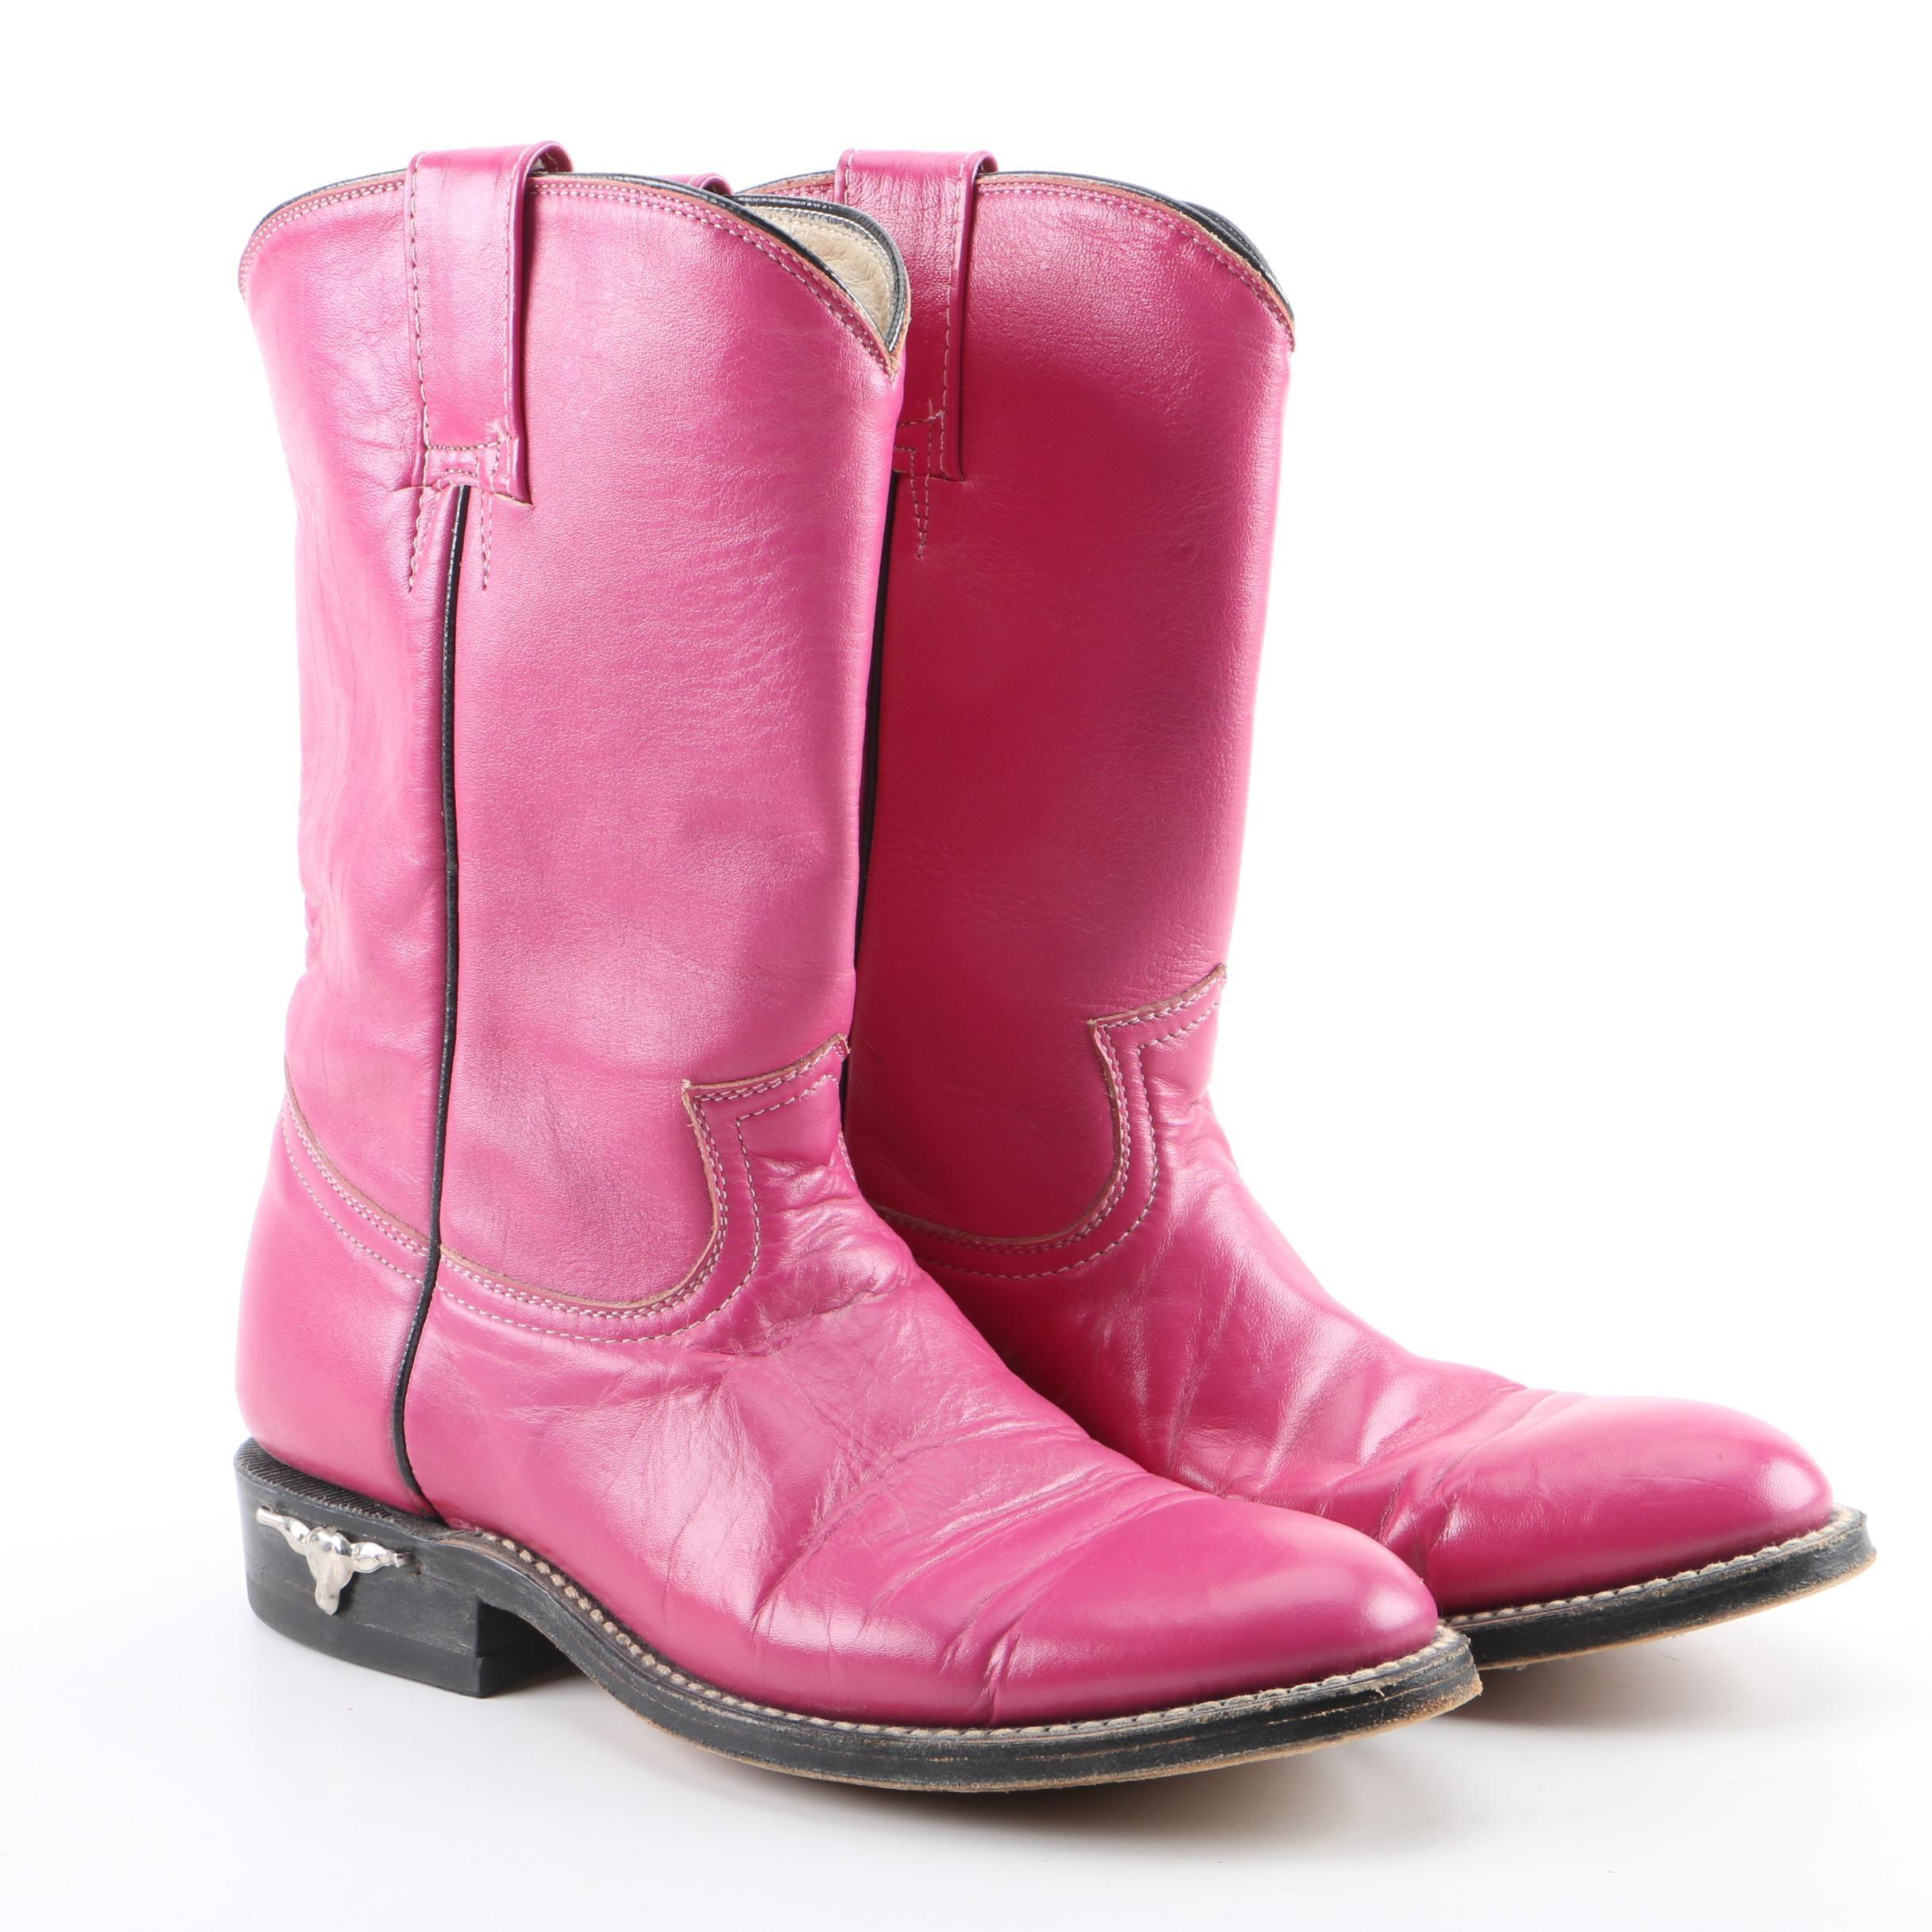 Women's Fuchsia Leather Western Boots